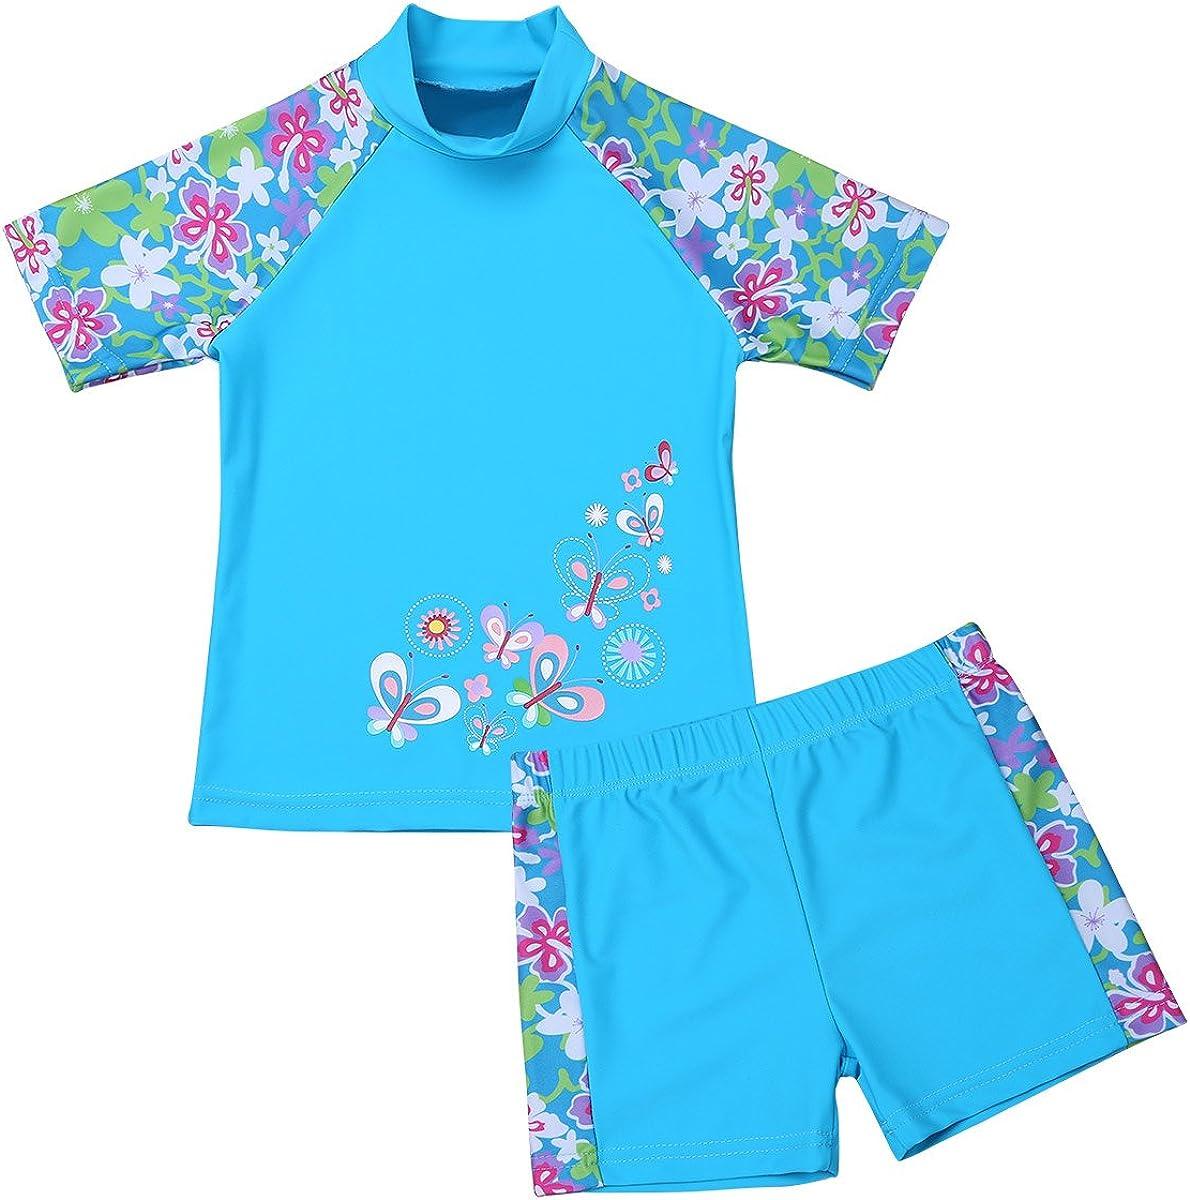 iEFiEL Big Girls Swimsuit UPF 50+ UV Two Piece Swimwear Tankini Rash Guard Top Boyshort Sets Beach Wear Bathing Suit